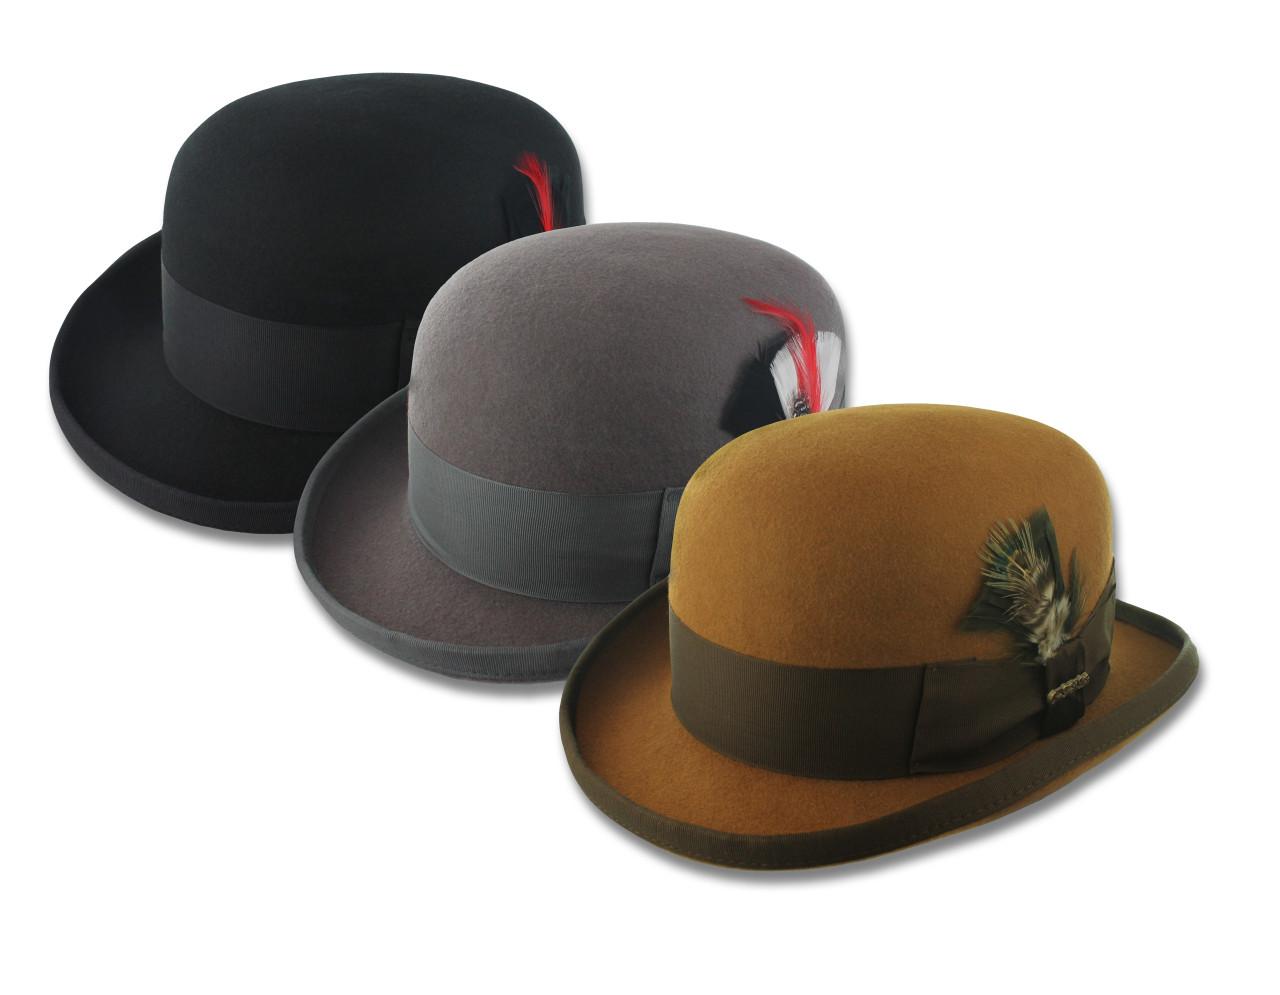 5ae4b31470c 100% Wool Felt Bowler Hat, Mens Derby, Black, Charcoal Gray, Cognac. Loading  zoom